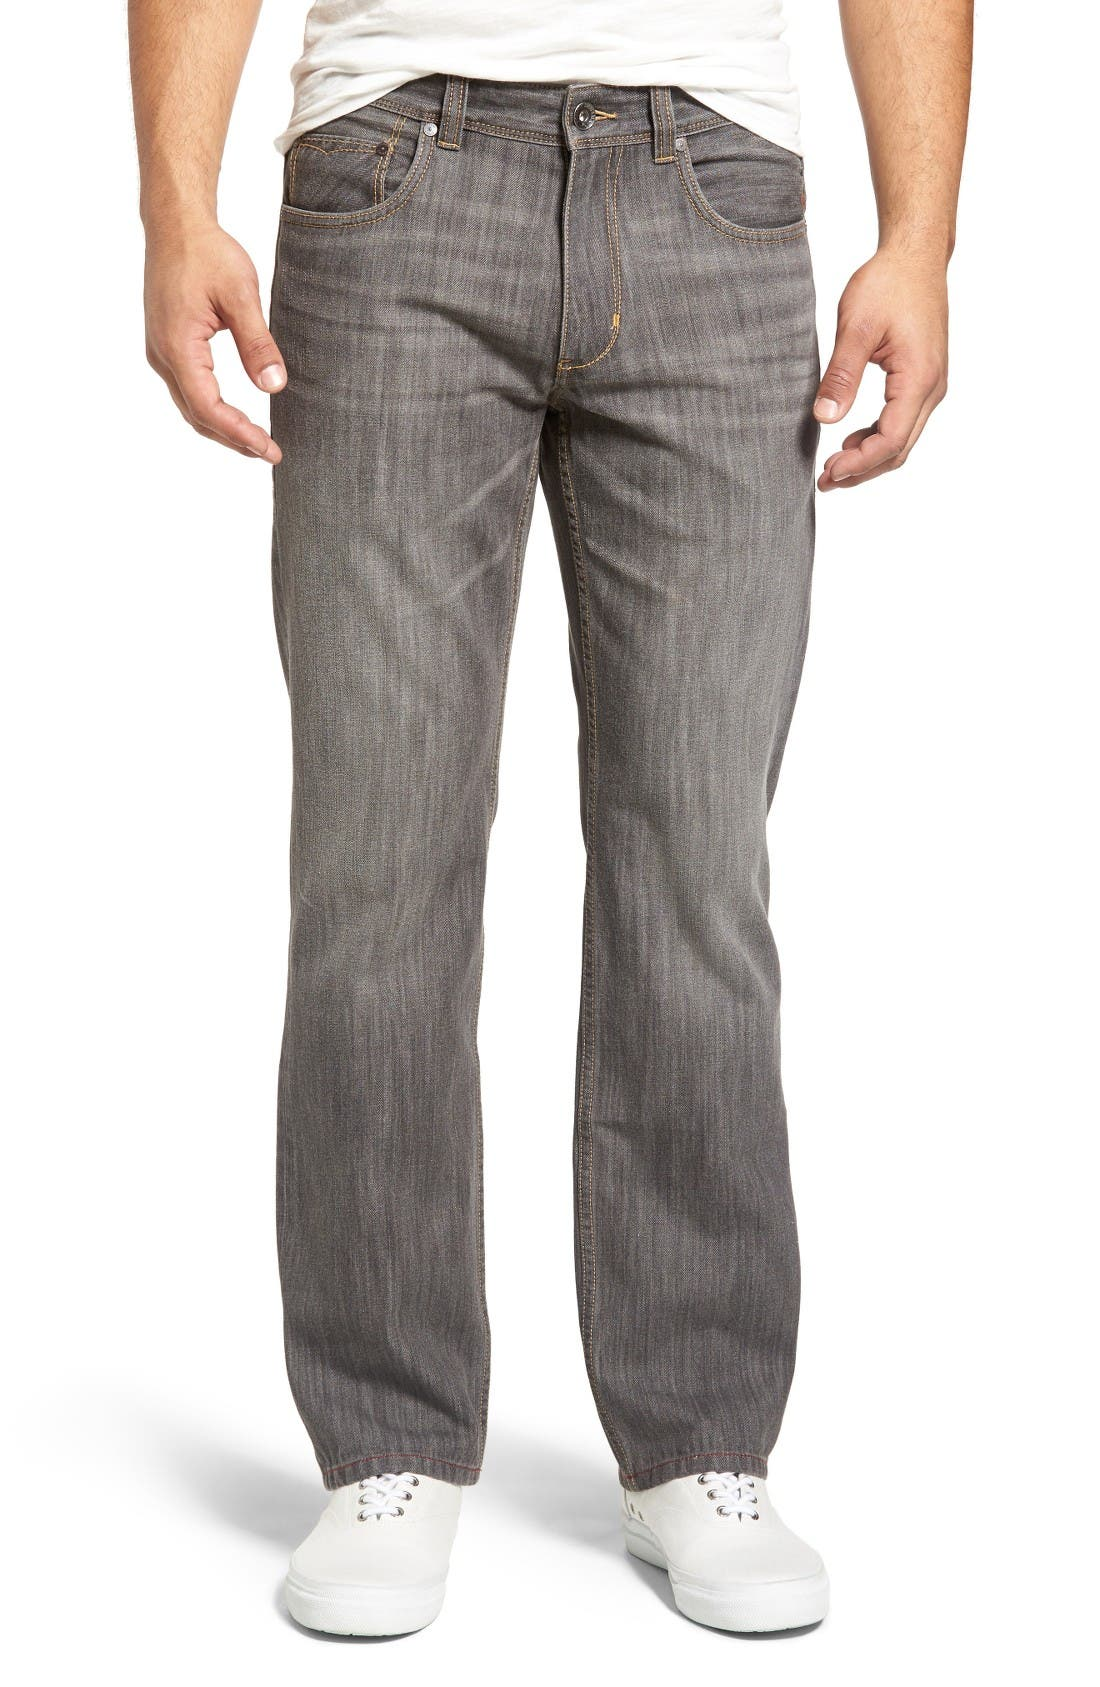 Barbados Straight Leg Jeans,                             Main thumbnail 1, color,                             Vintage Grey Wash